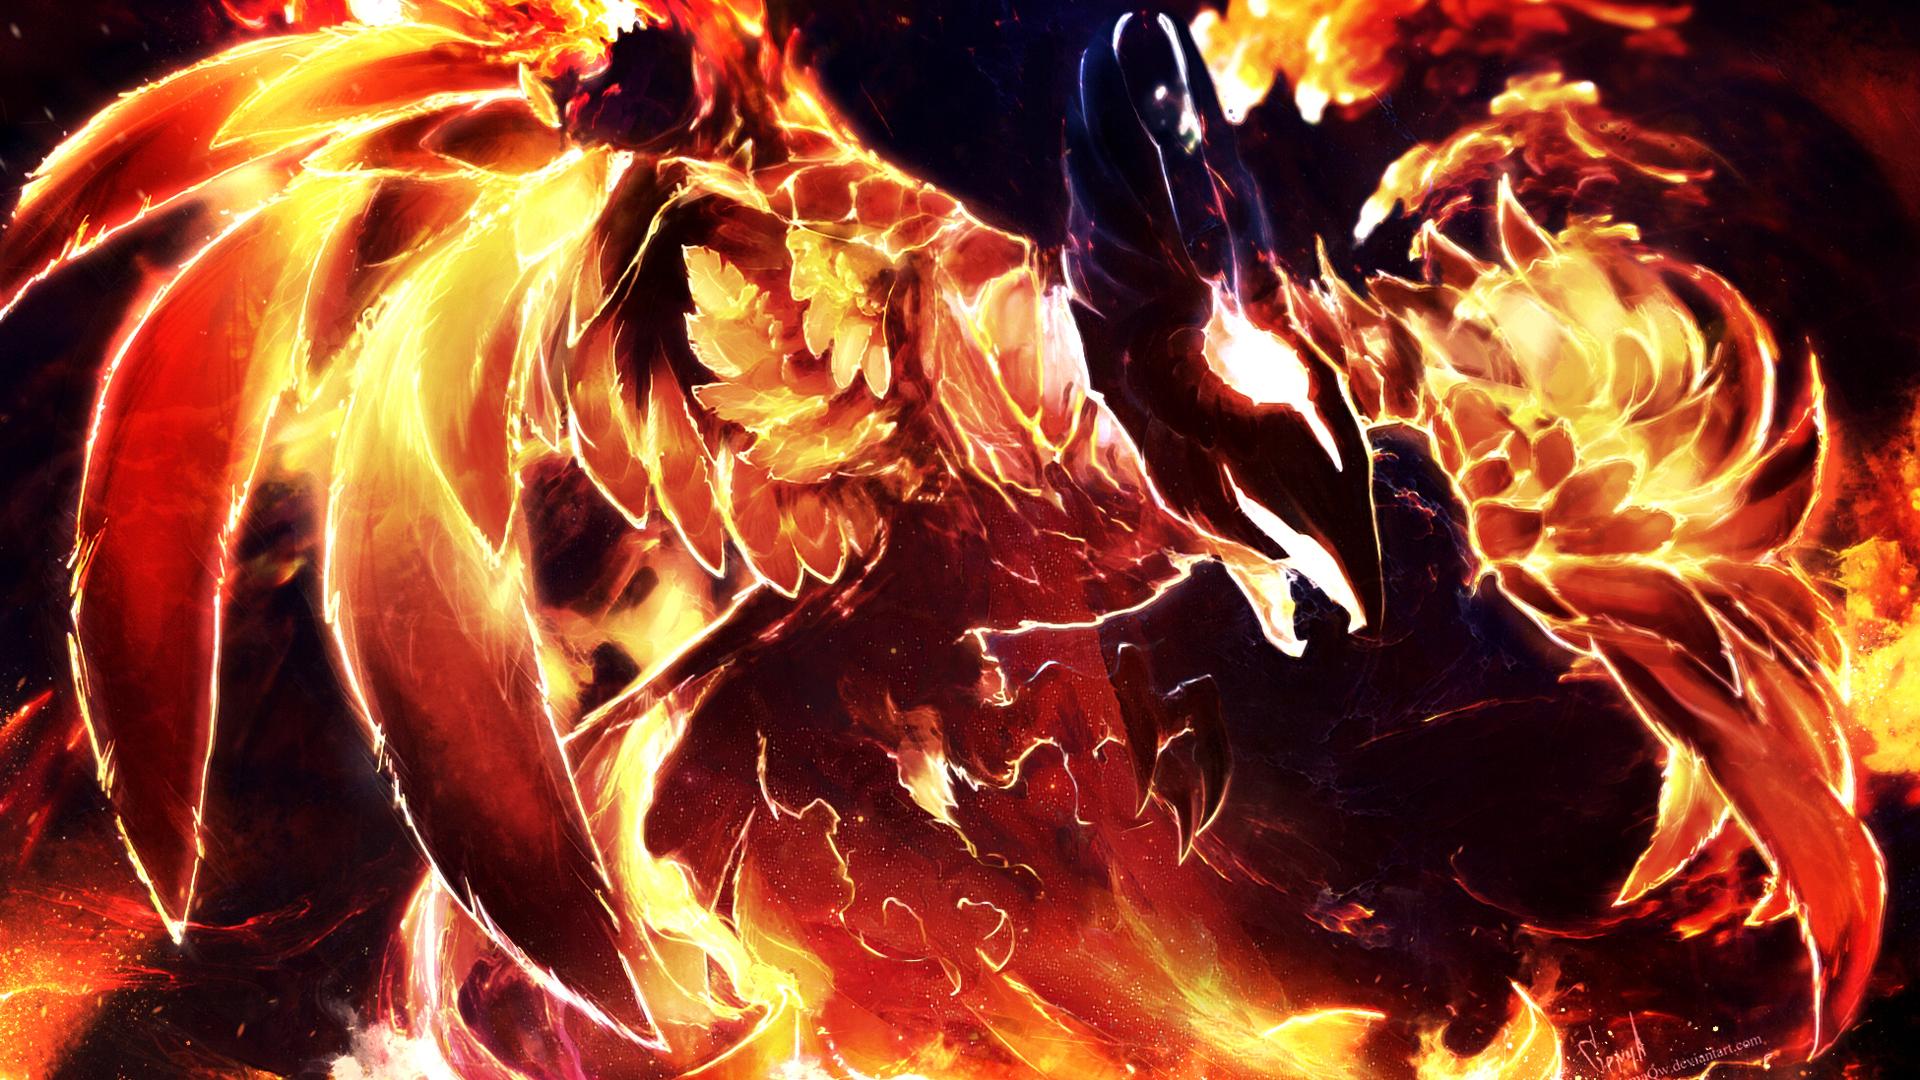 phoenix wallpaper hd - photo #9